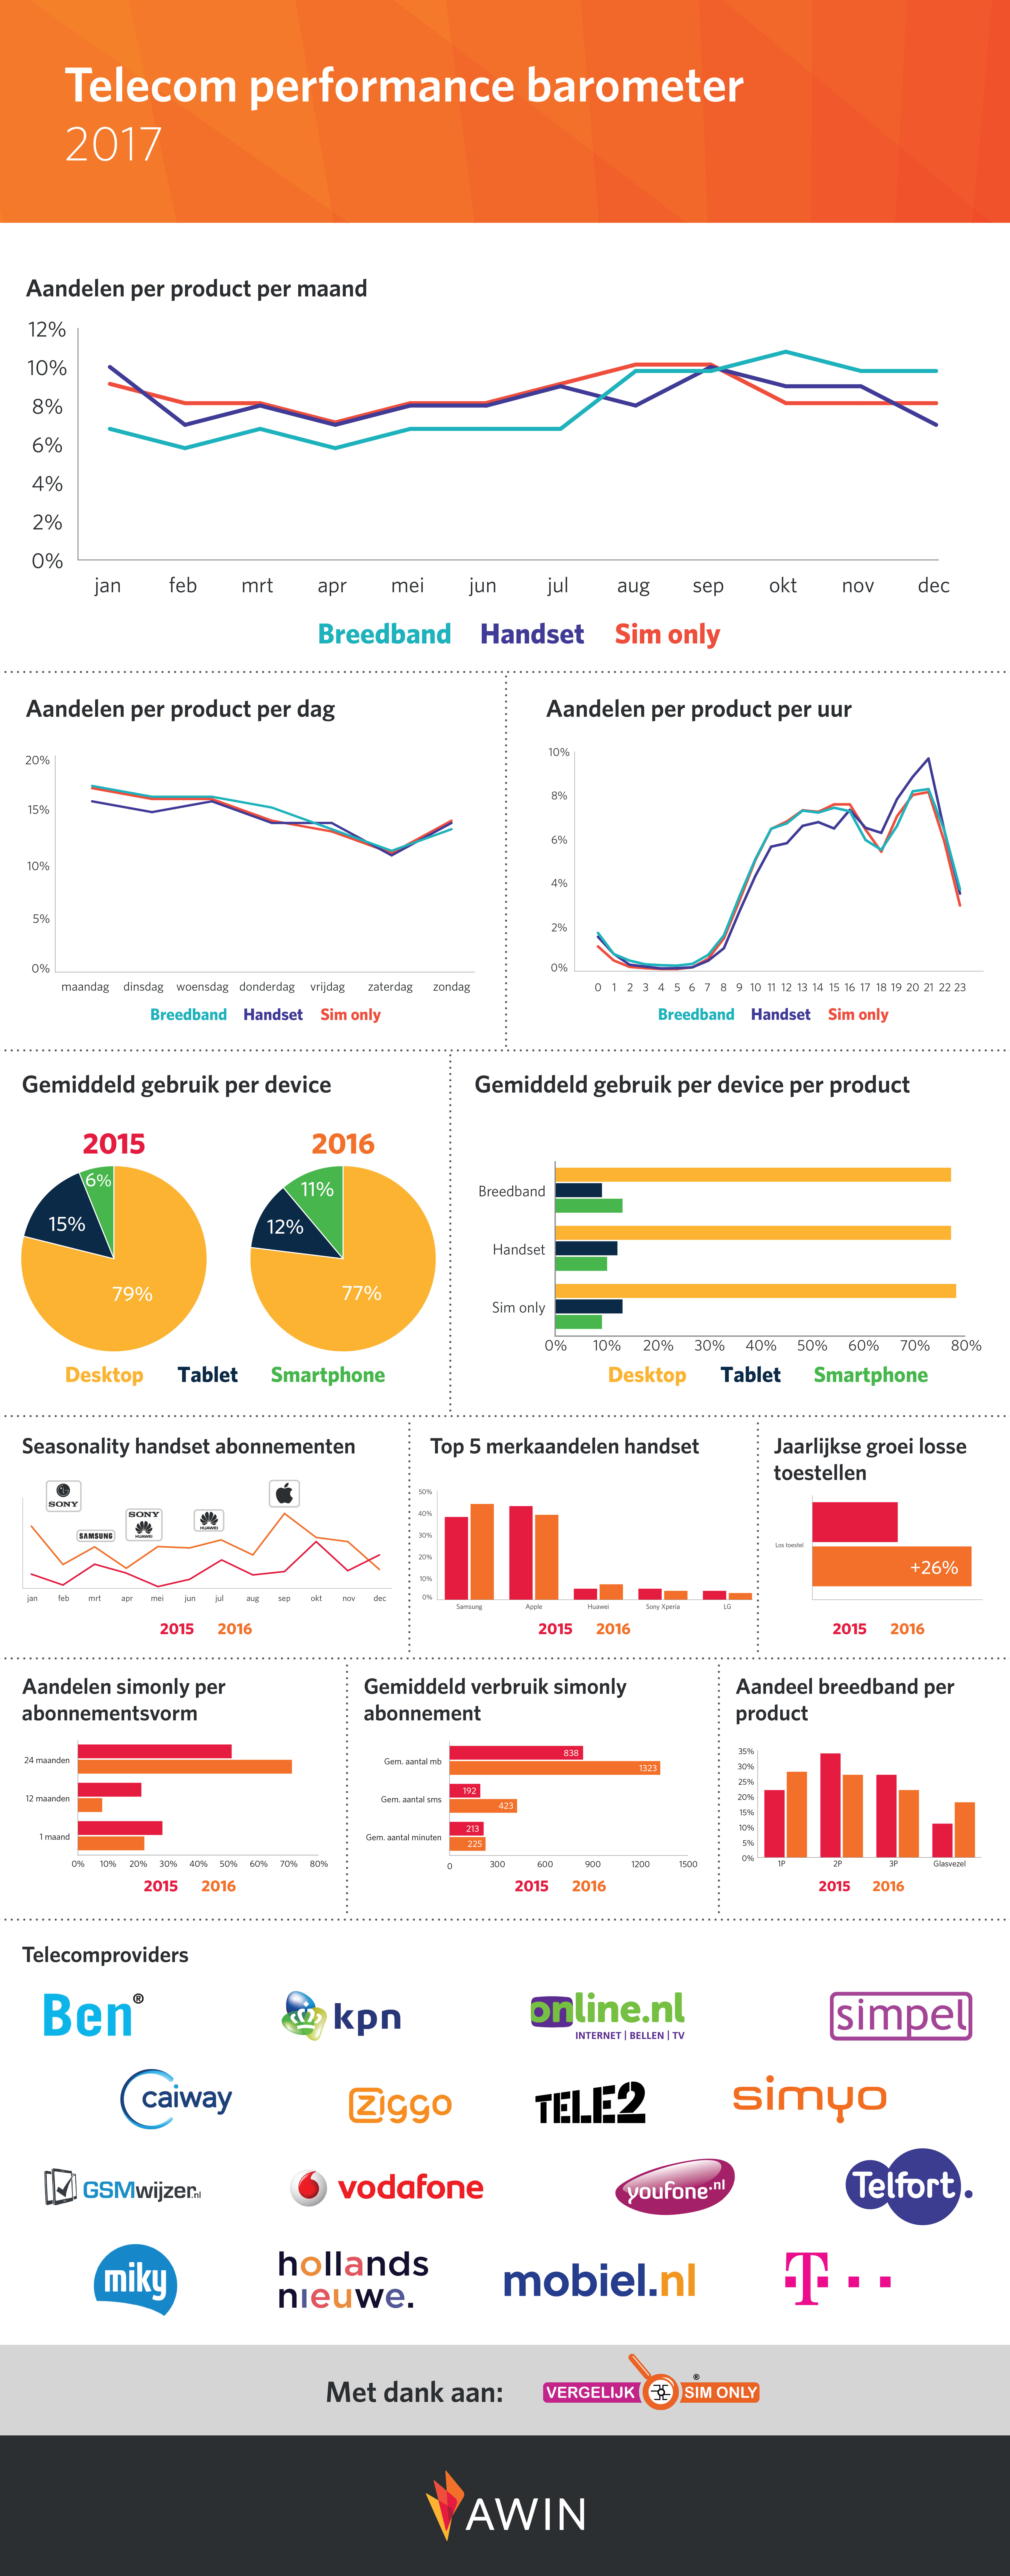 Awin telecom performance barometer 2017